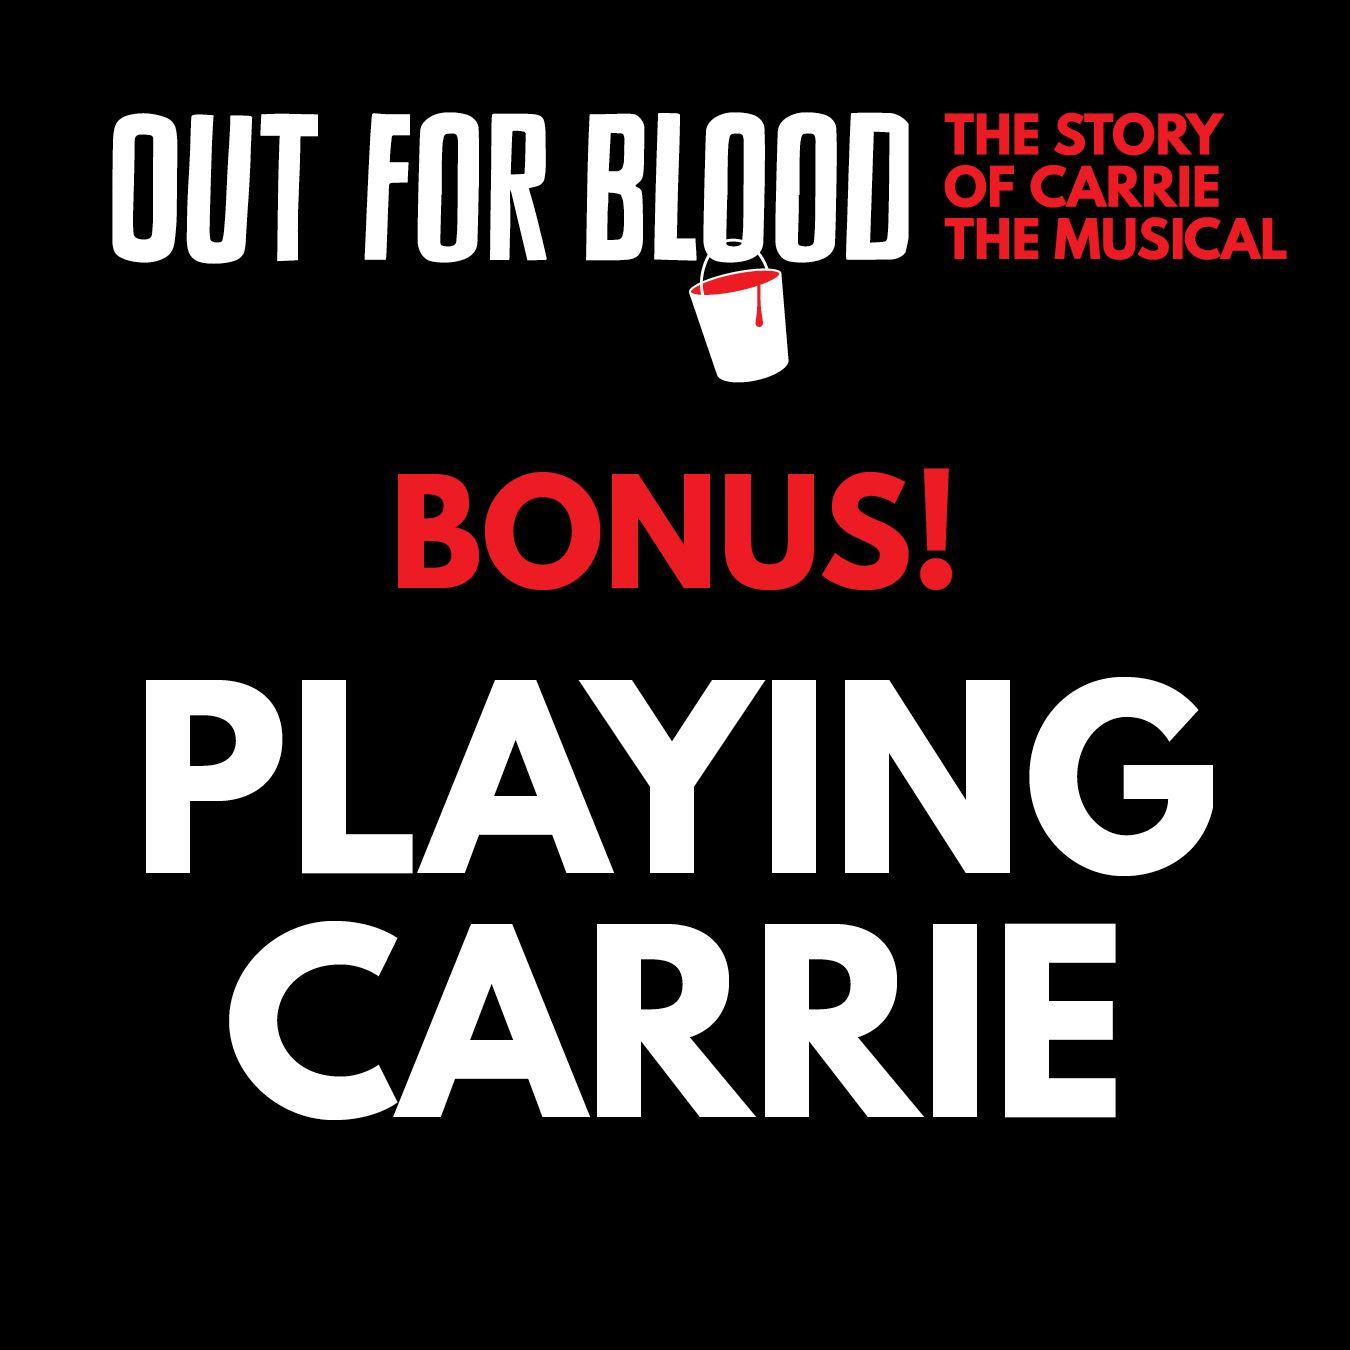 Bonus! Playing Carrie